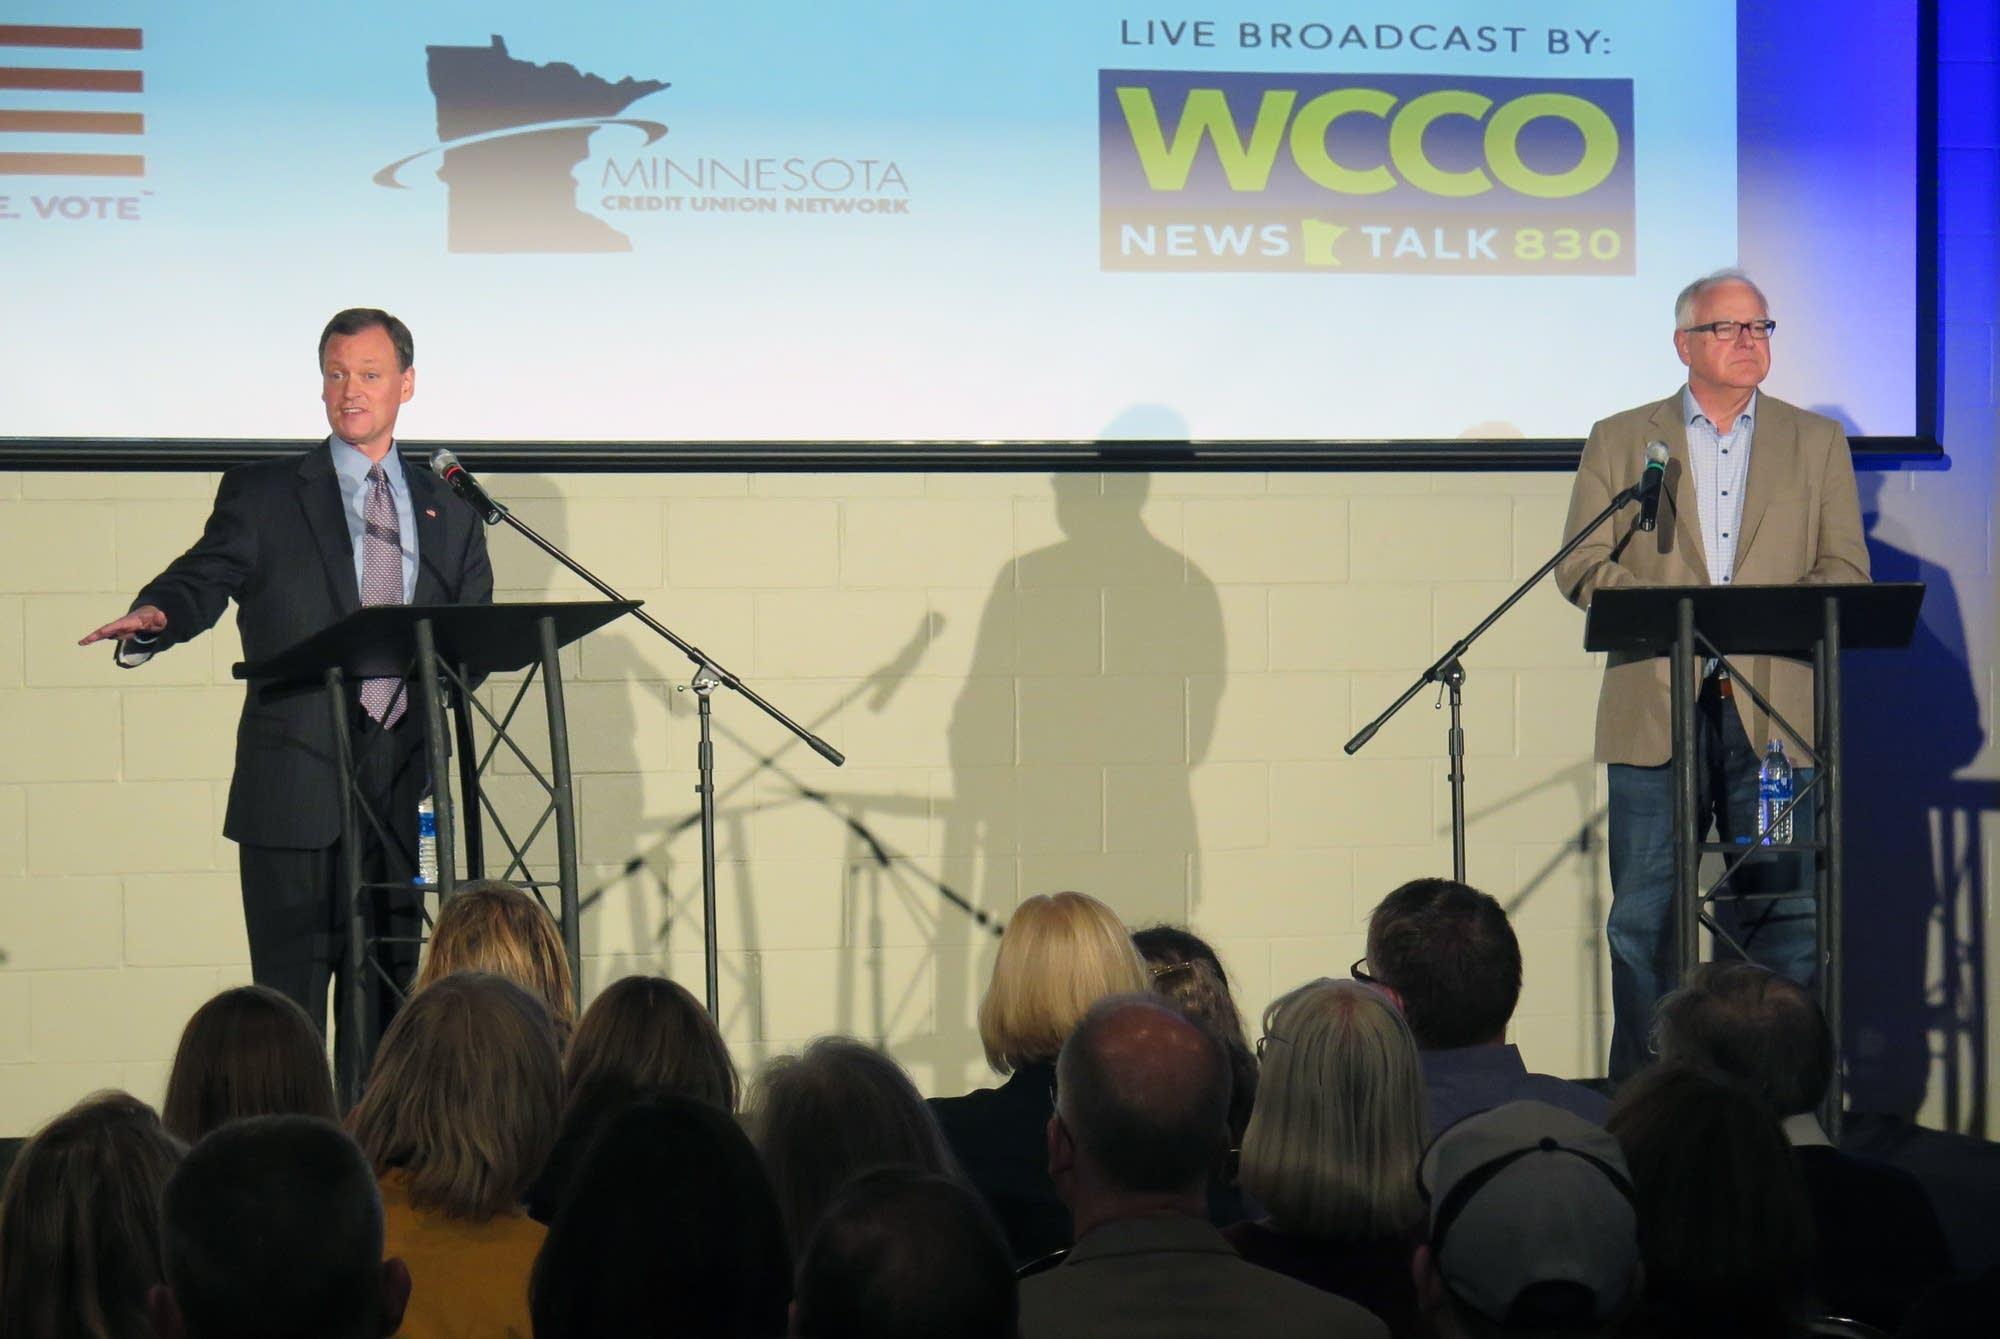 Jeff Johnson and Tim Walz debate in Willmar, Minn.